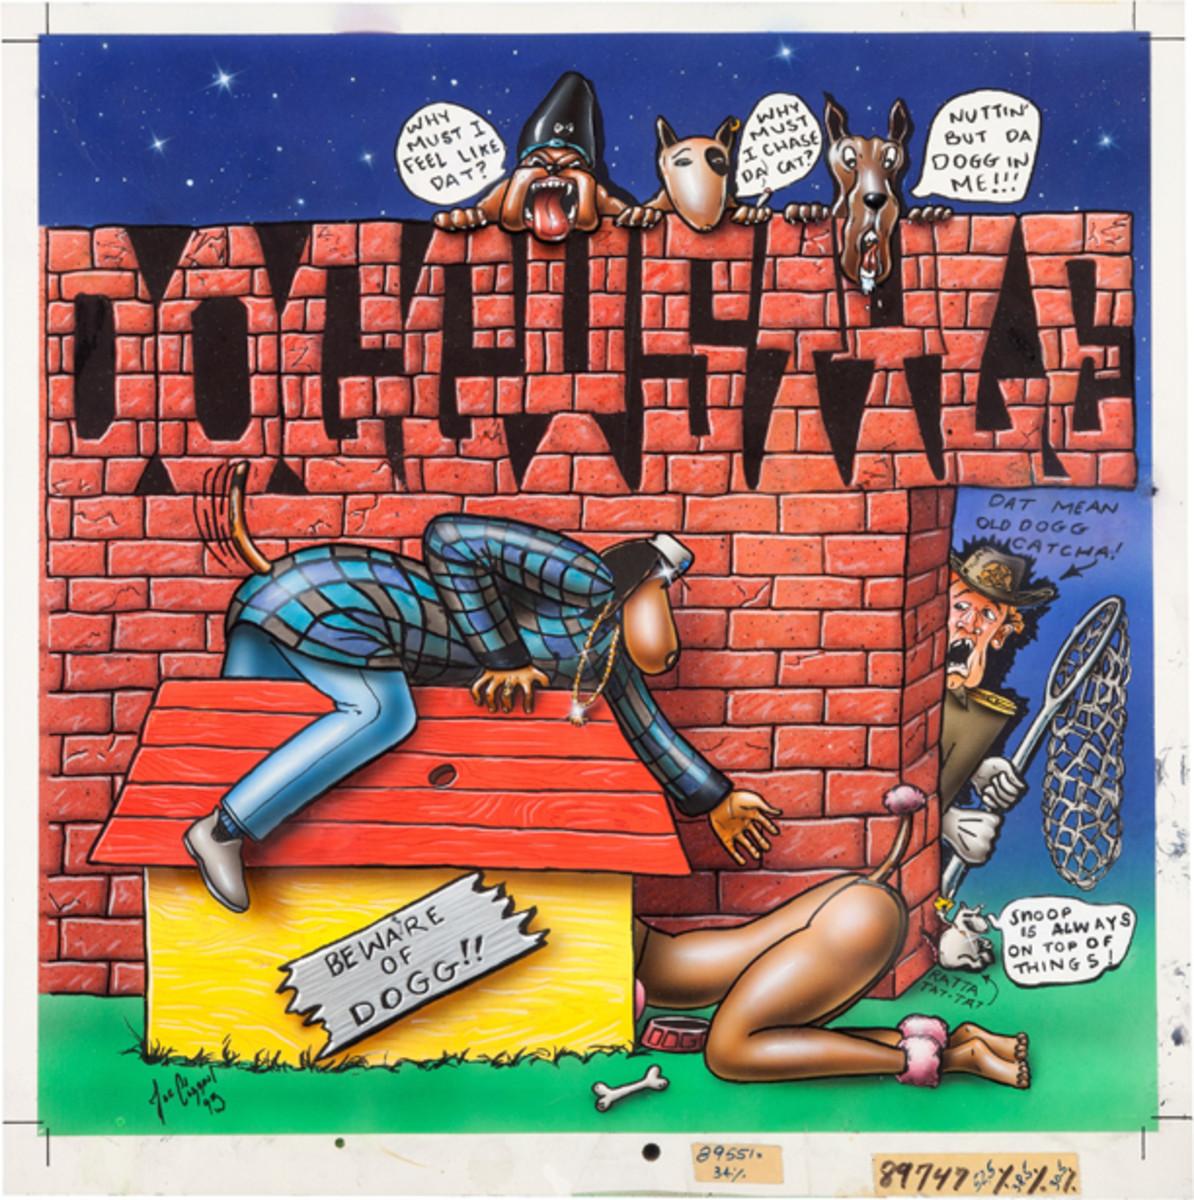 Snoop Dogg Doggystyle original album art